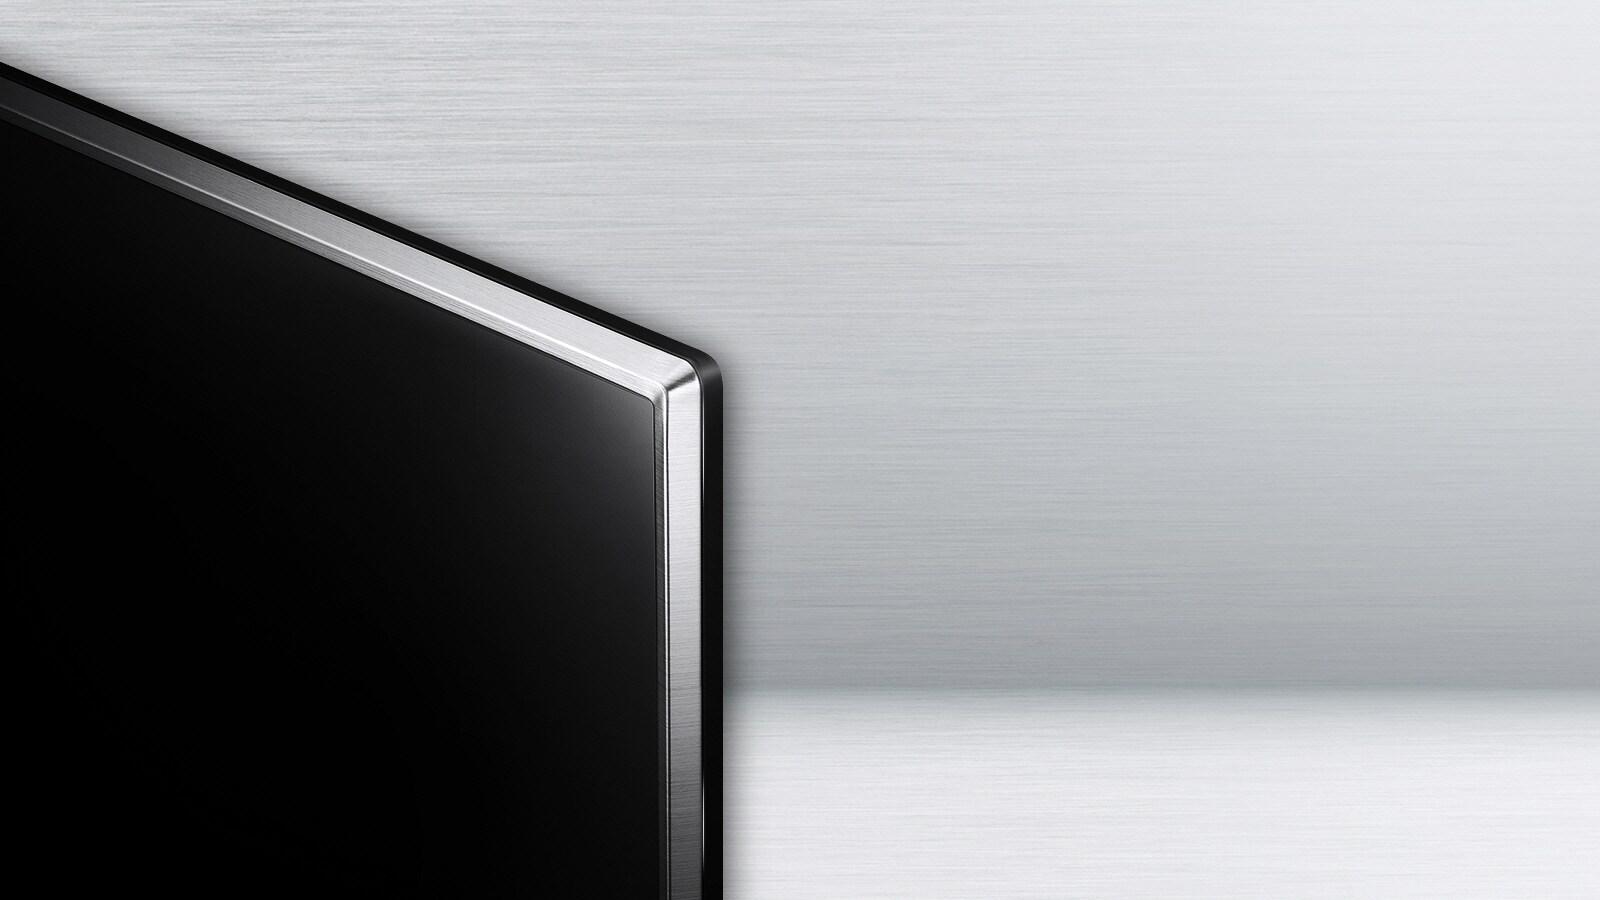 Televisor tv led ultra hd 4k 139 cm 55 39 39 smart tv lg - Steel framing espana ...